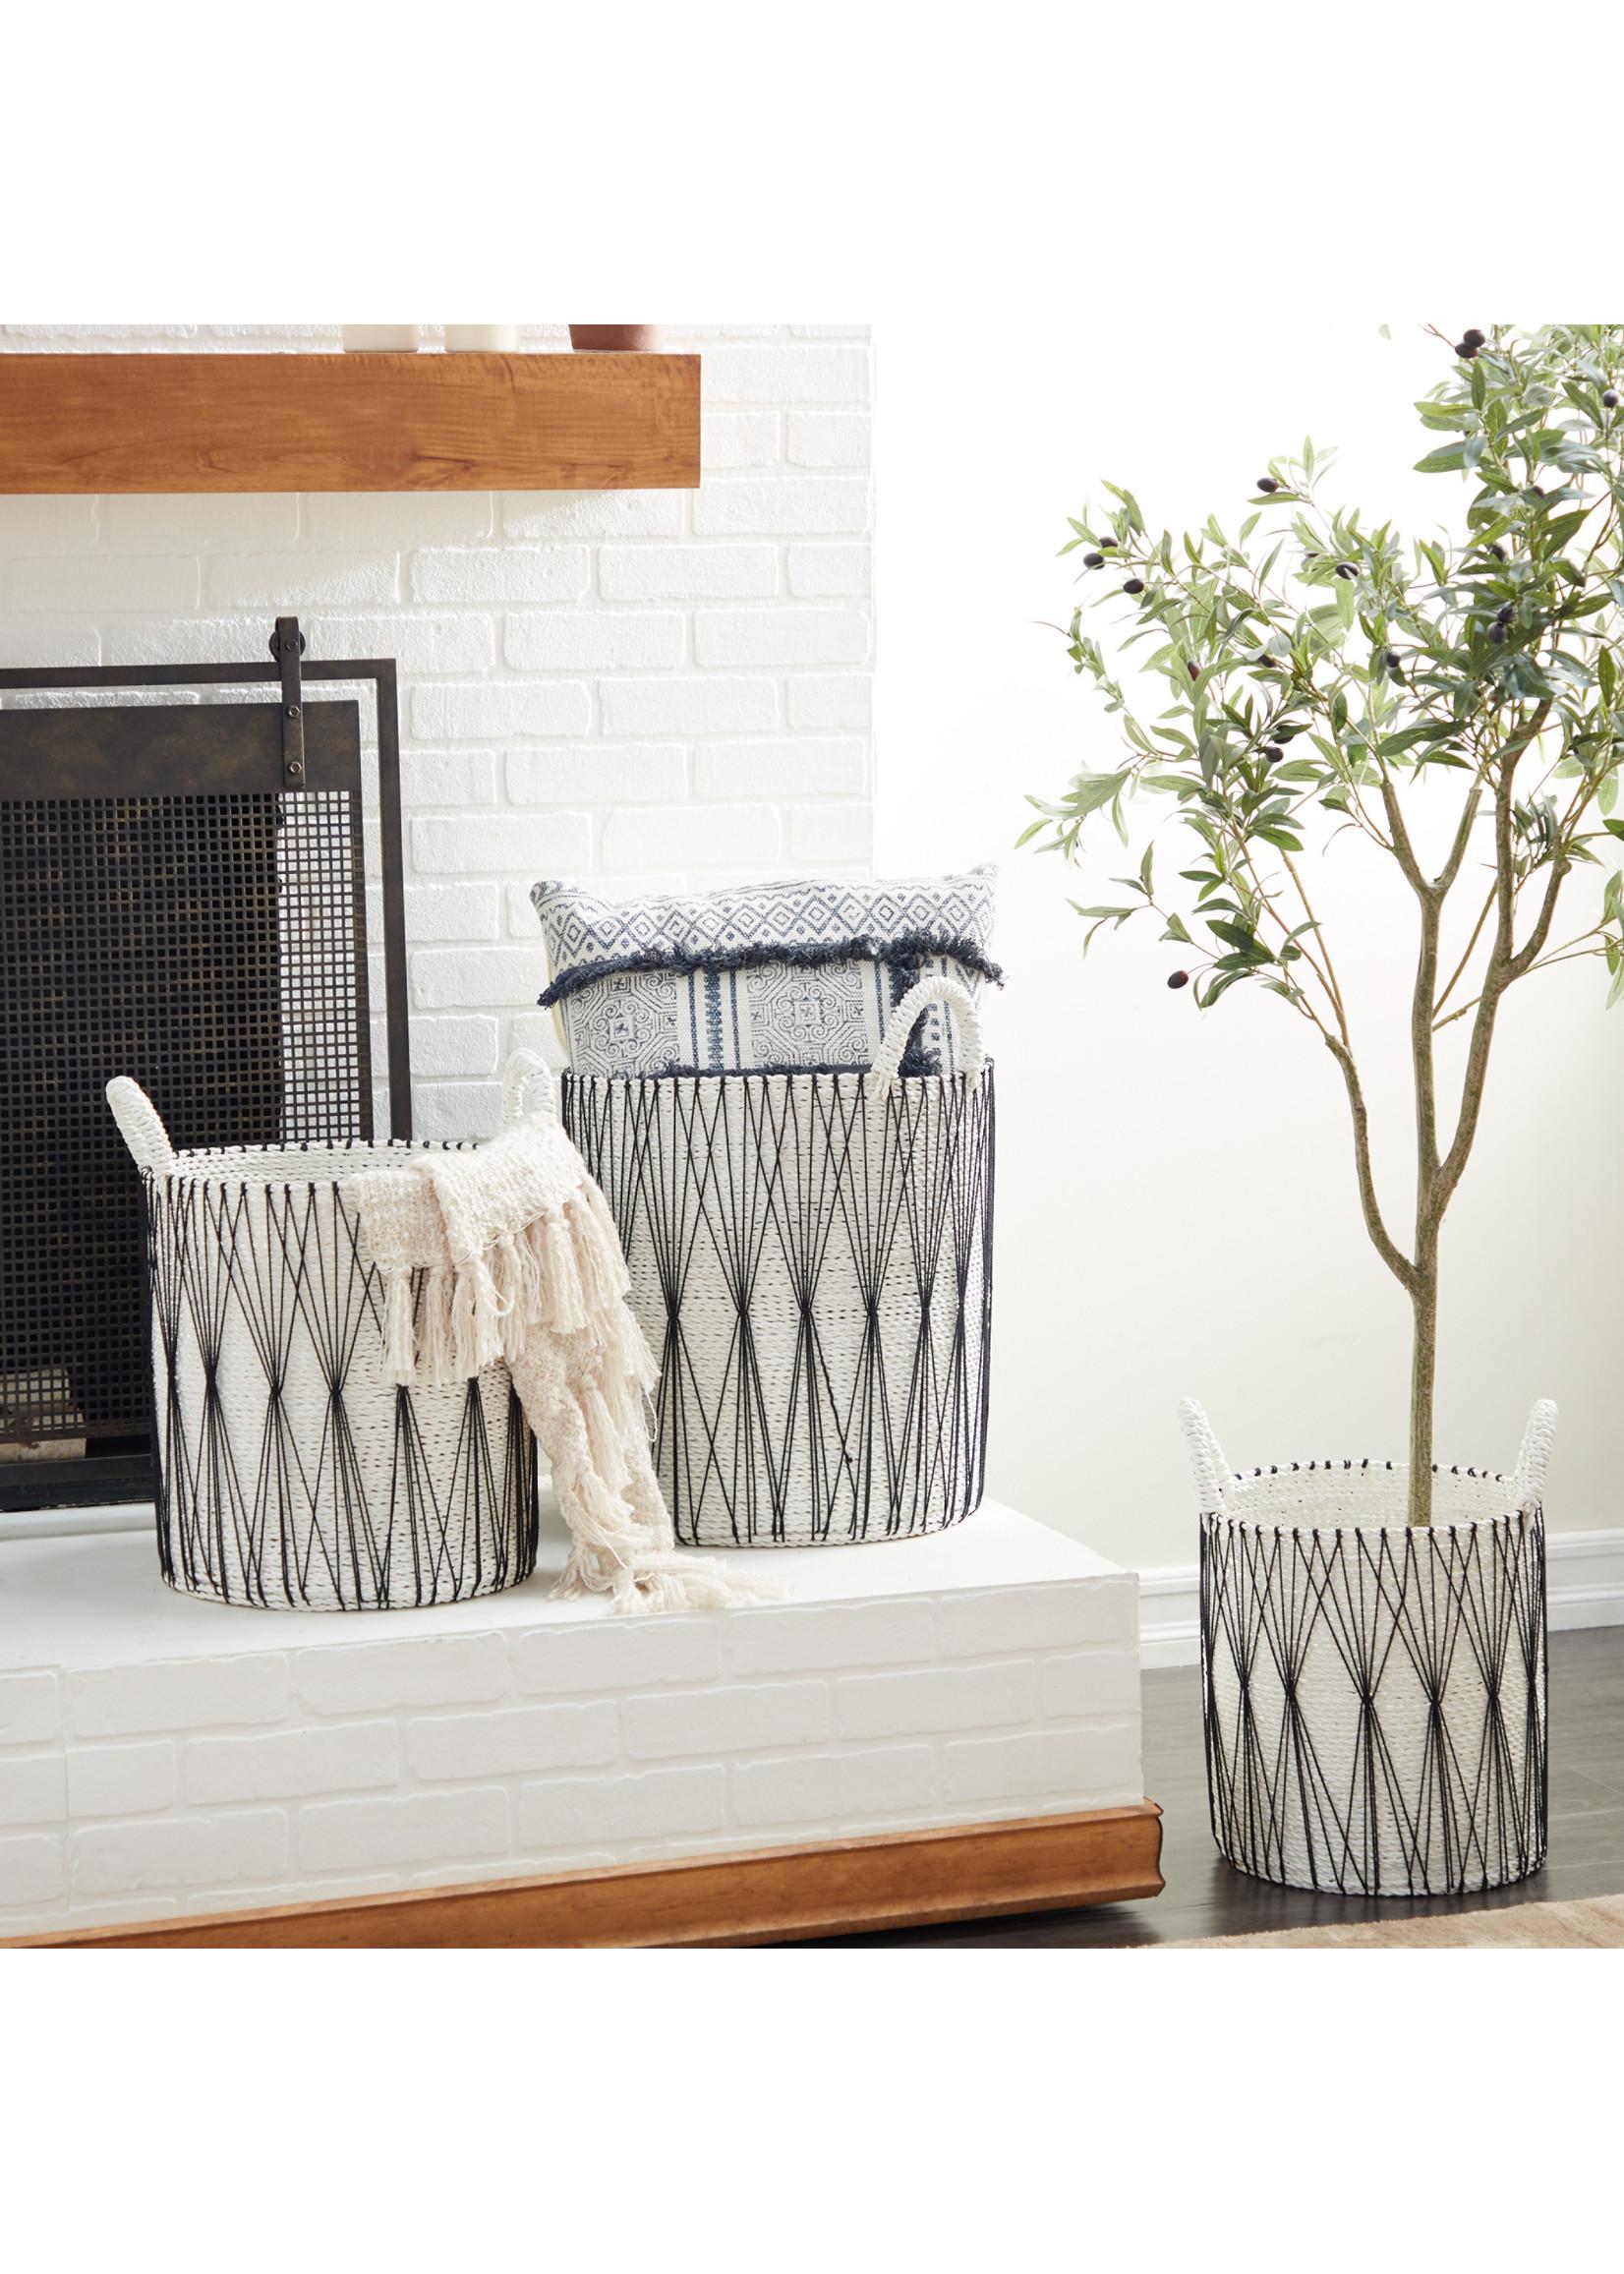 UMA Enterprises Black & White Cotton Basket - Medium